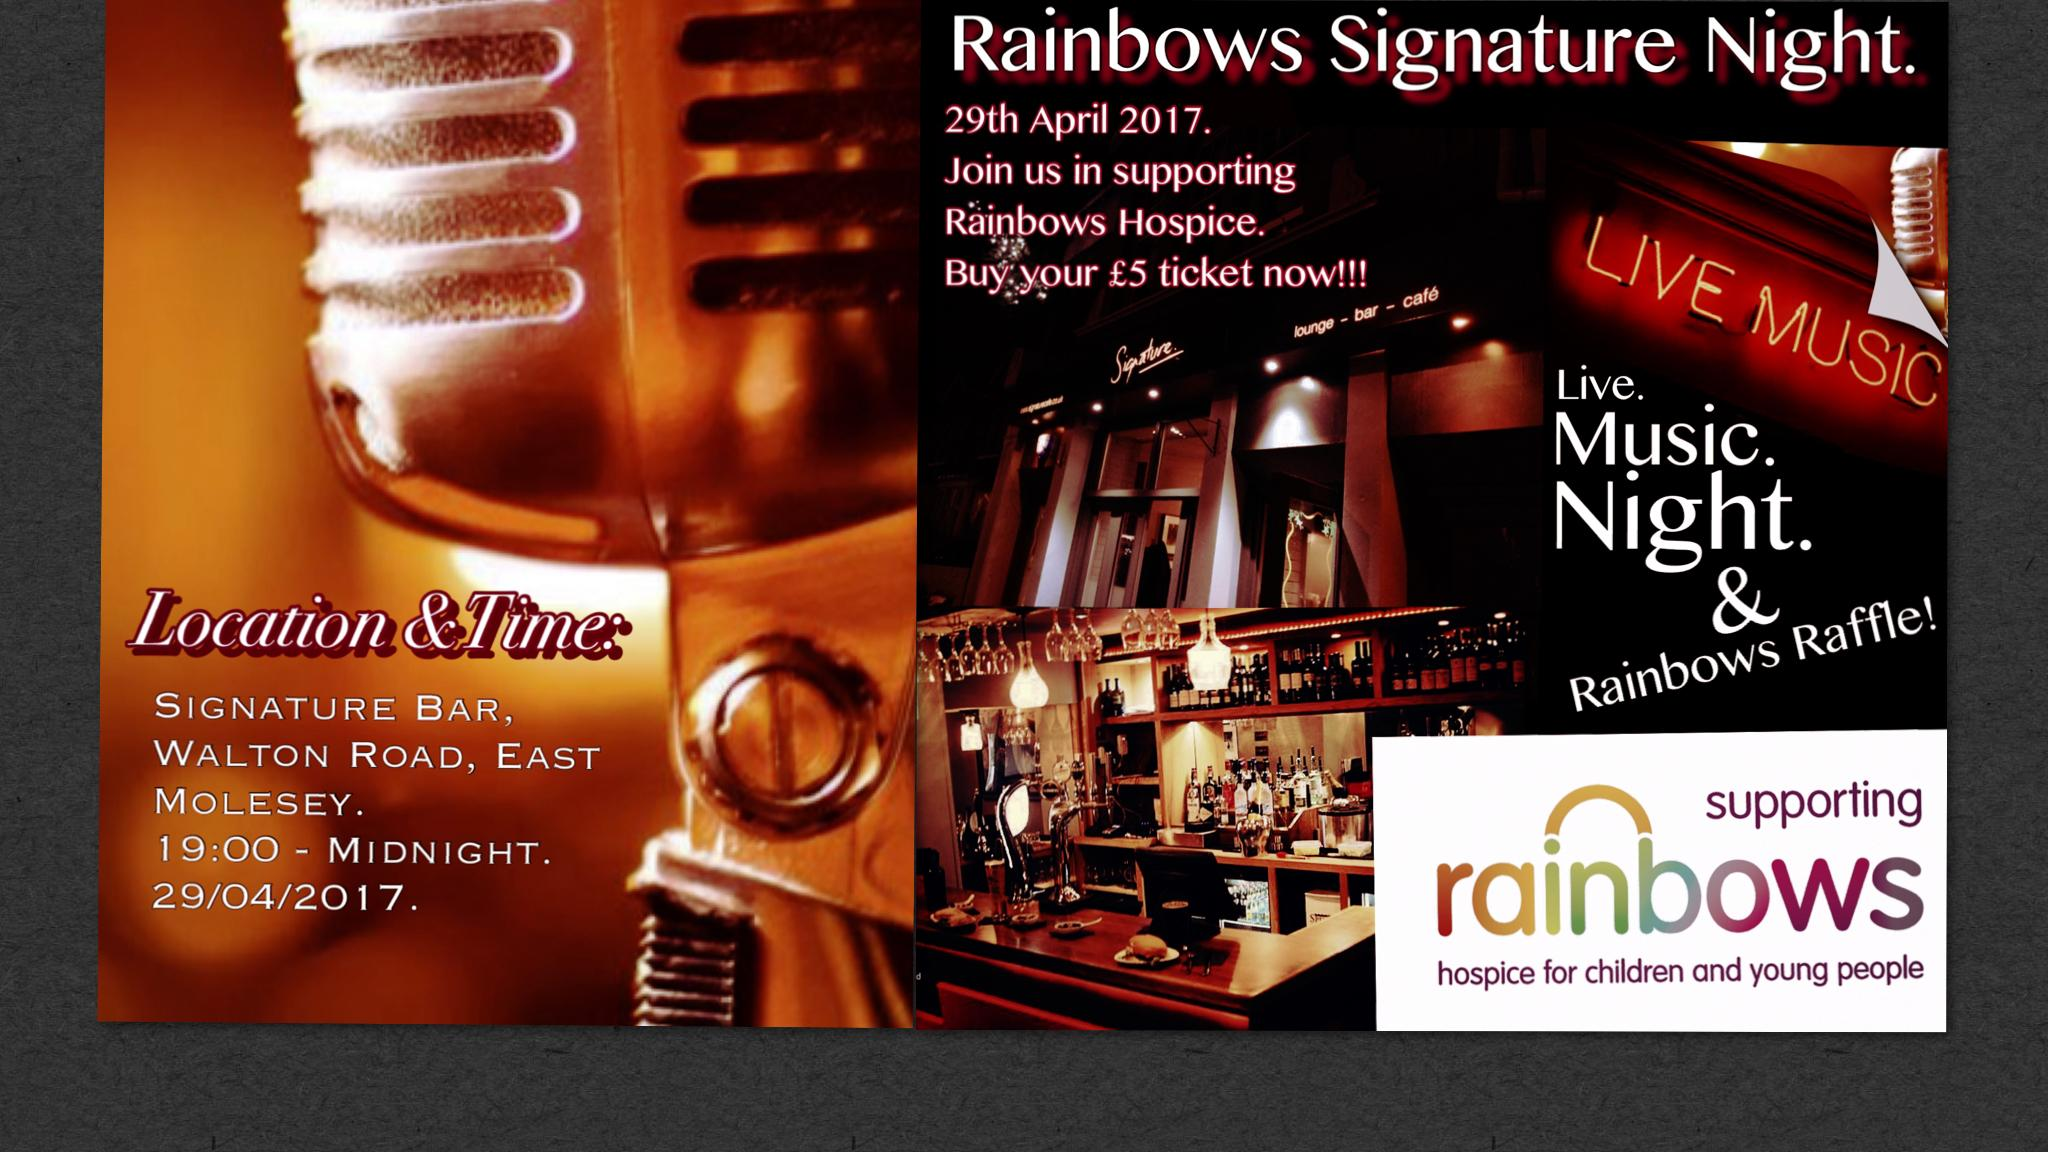 Rainbows Signature Night.